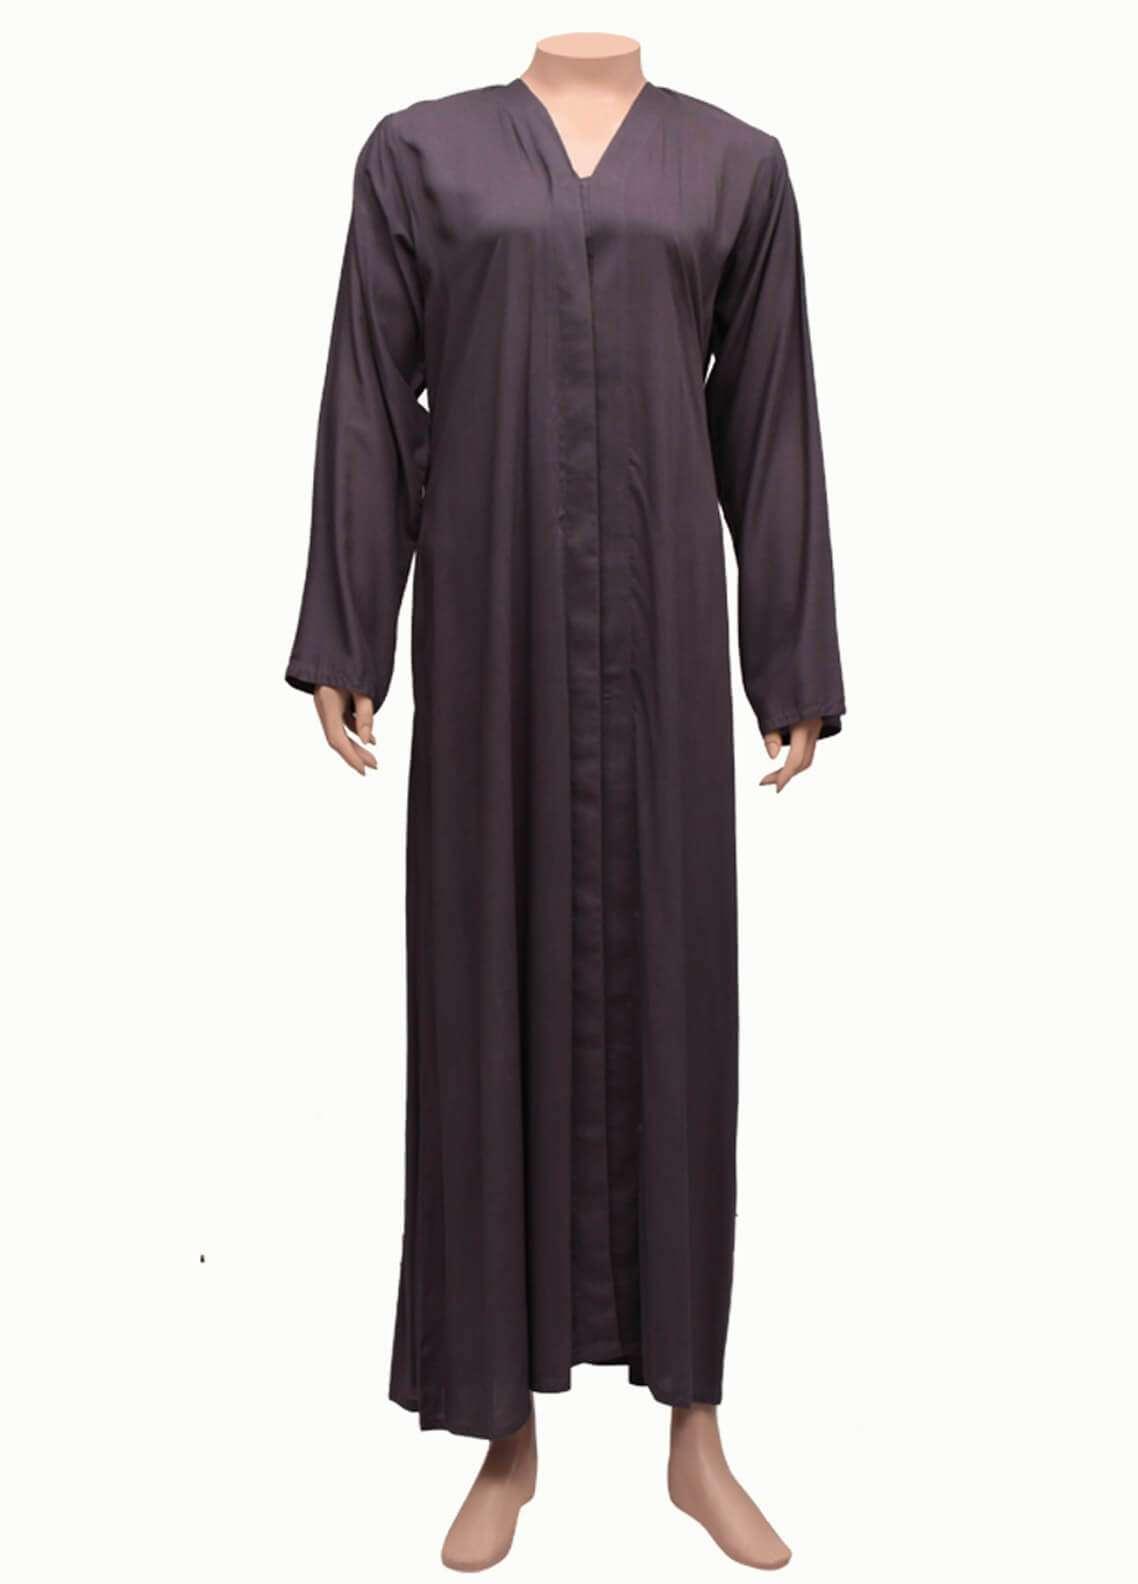 Hijab ul Hareem  Abayas New Stylish Designered Lawn Abaya 0116-P-1